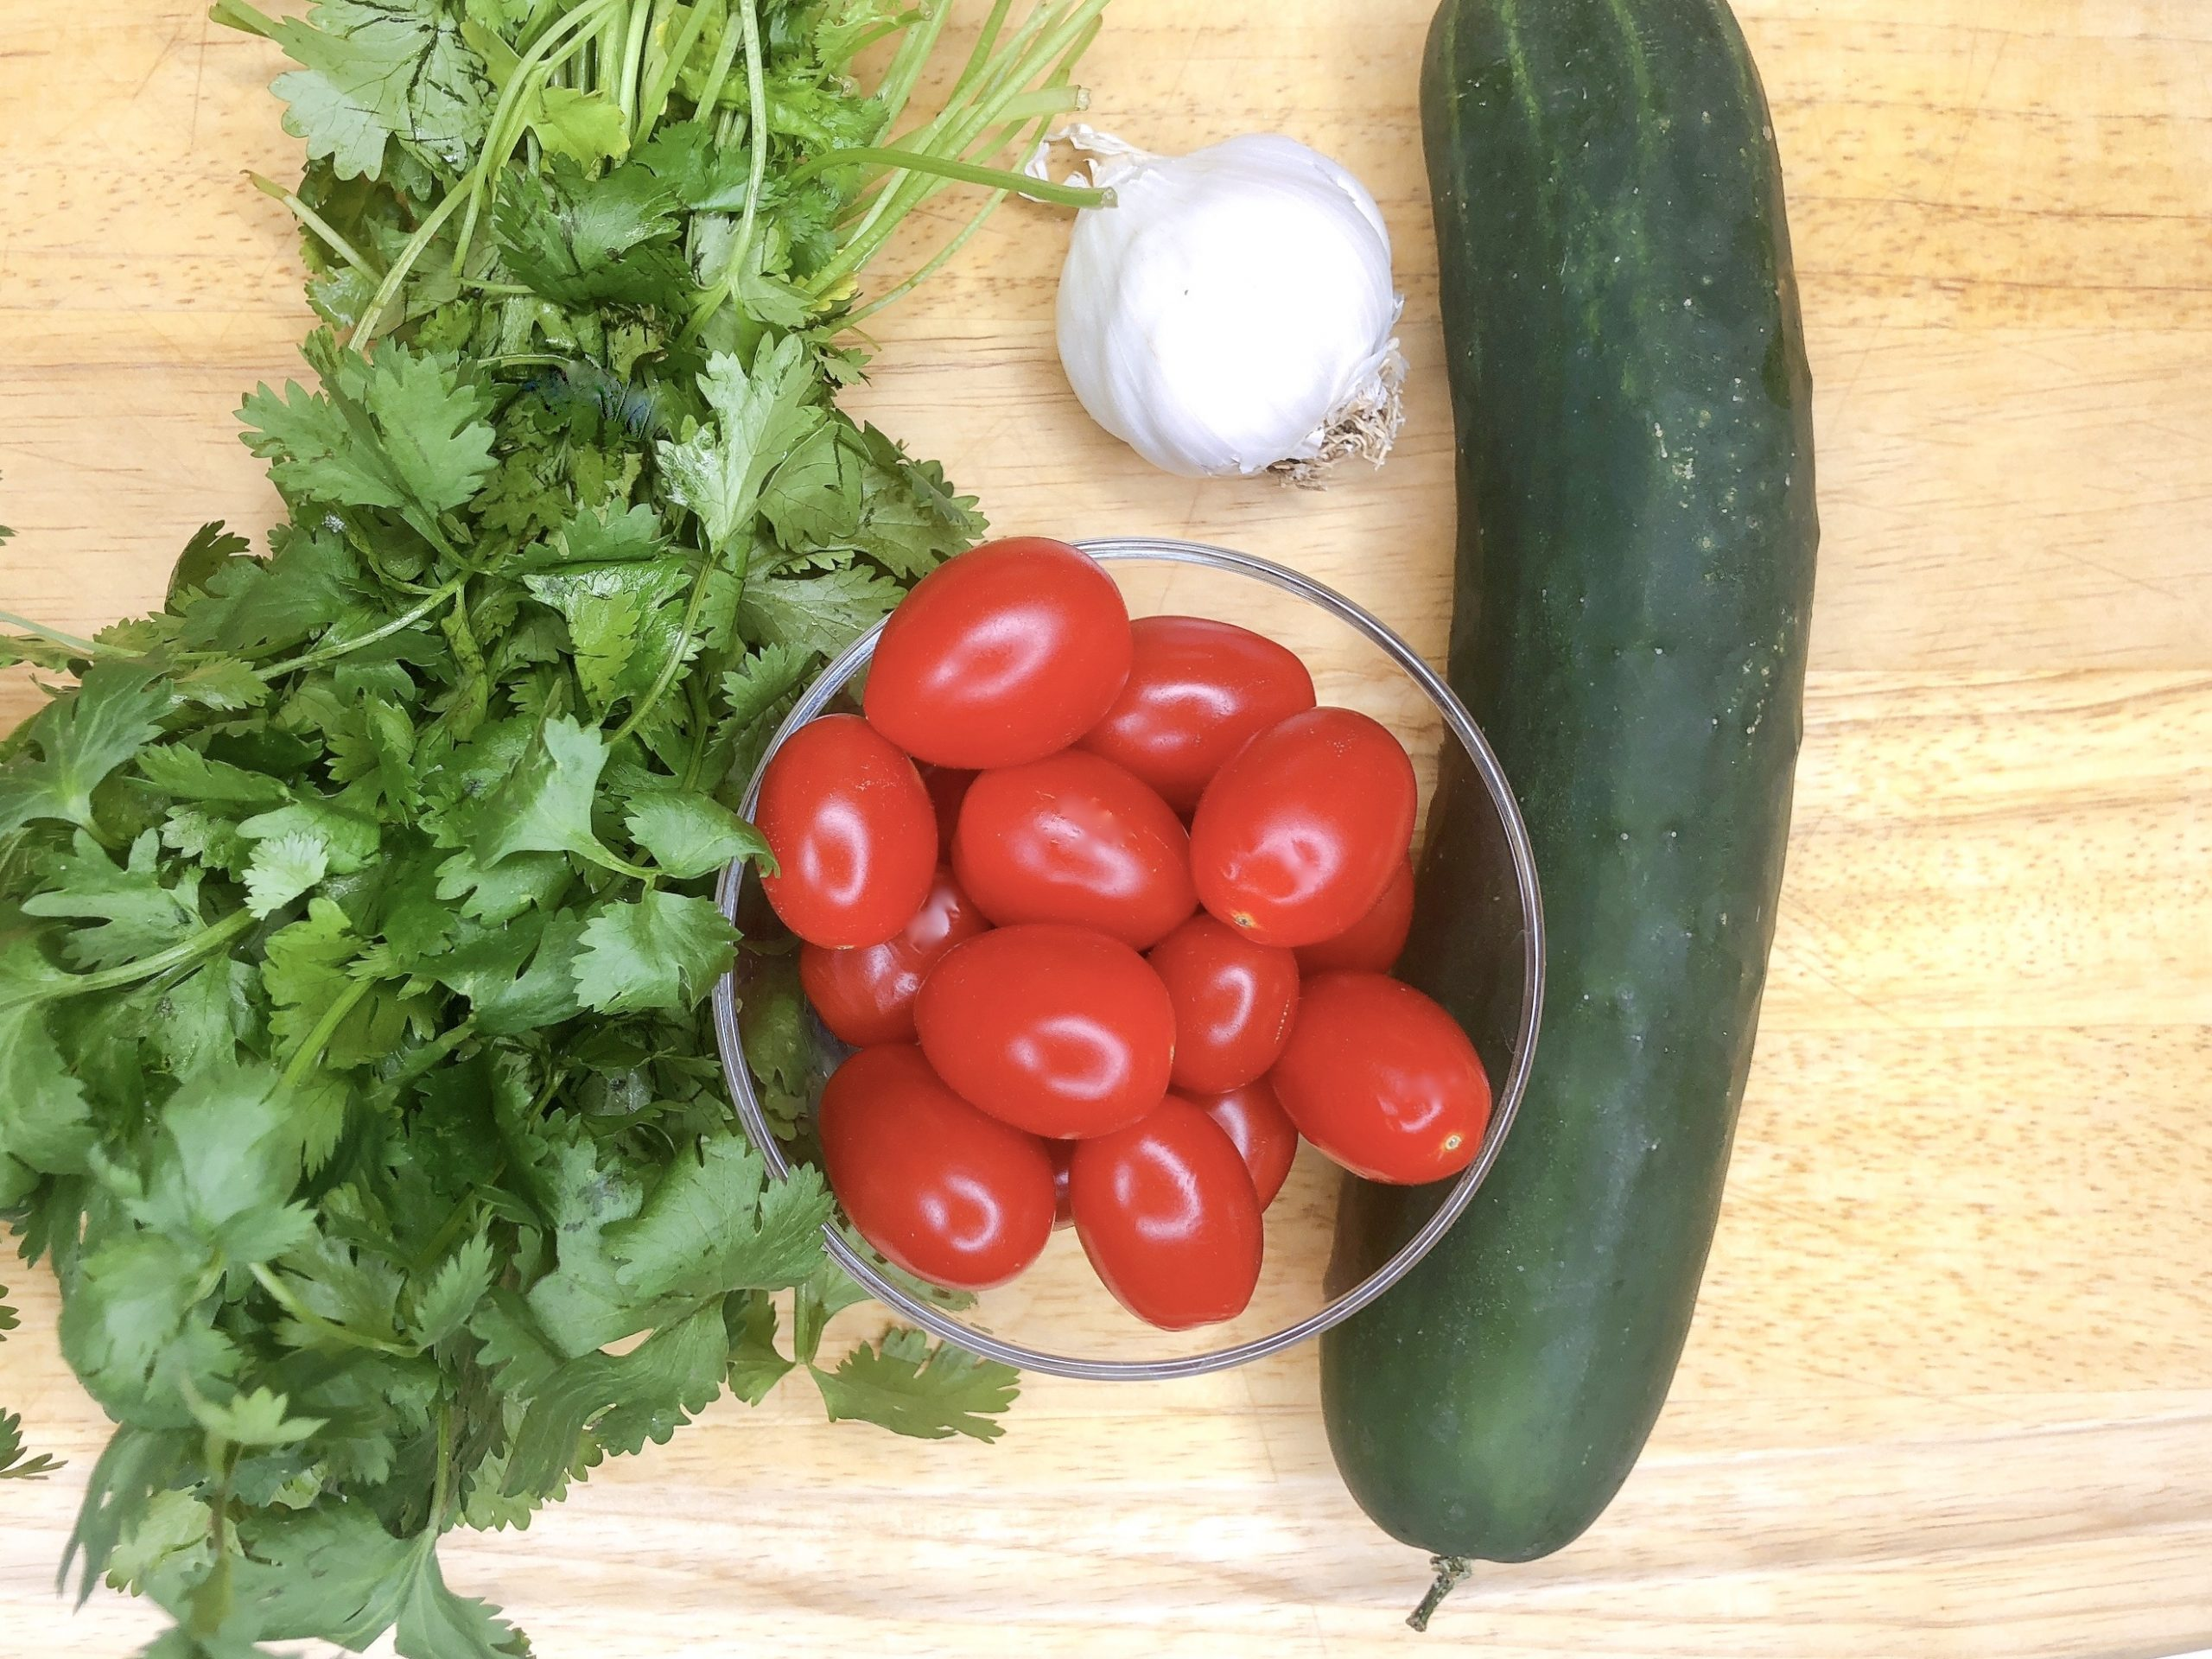 fresh cucumber, tomatoes, garlic and cilantro